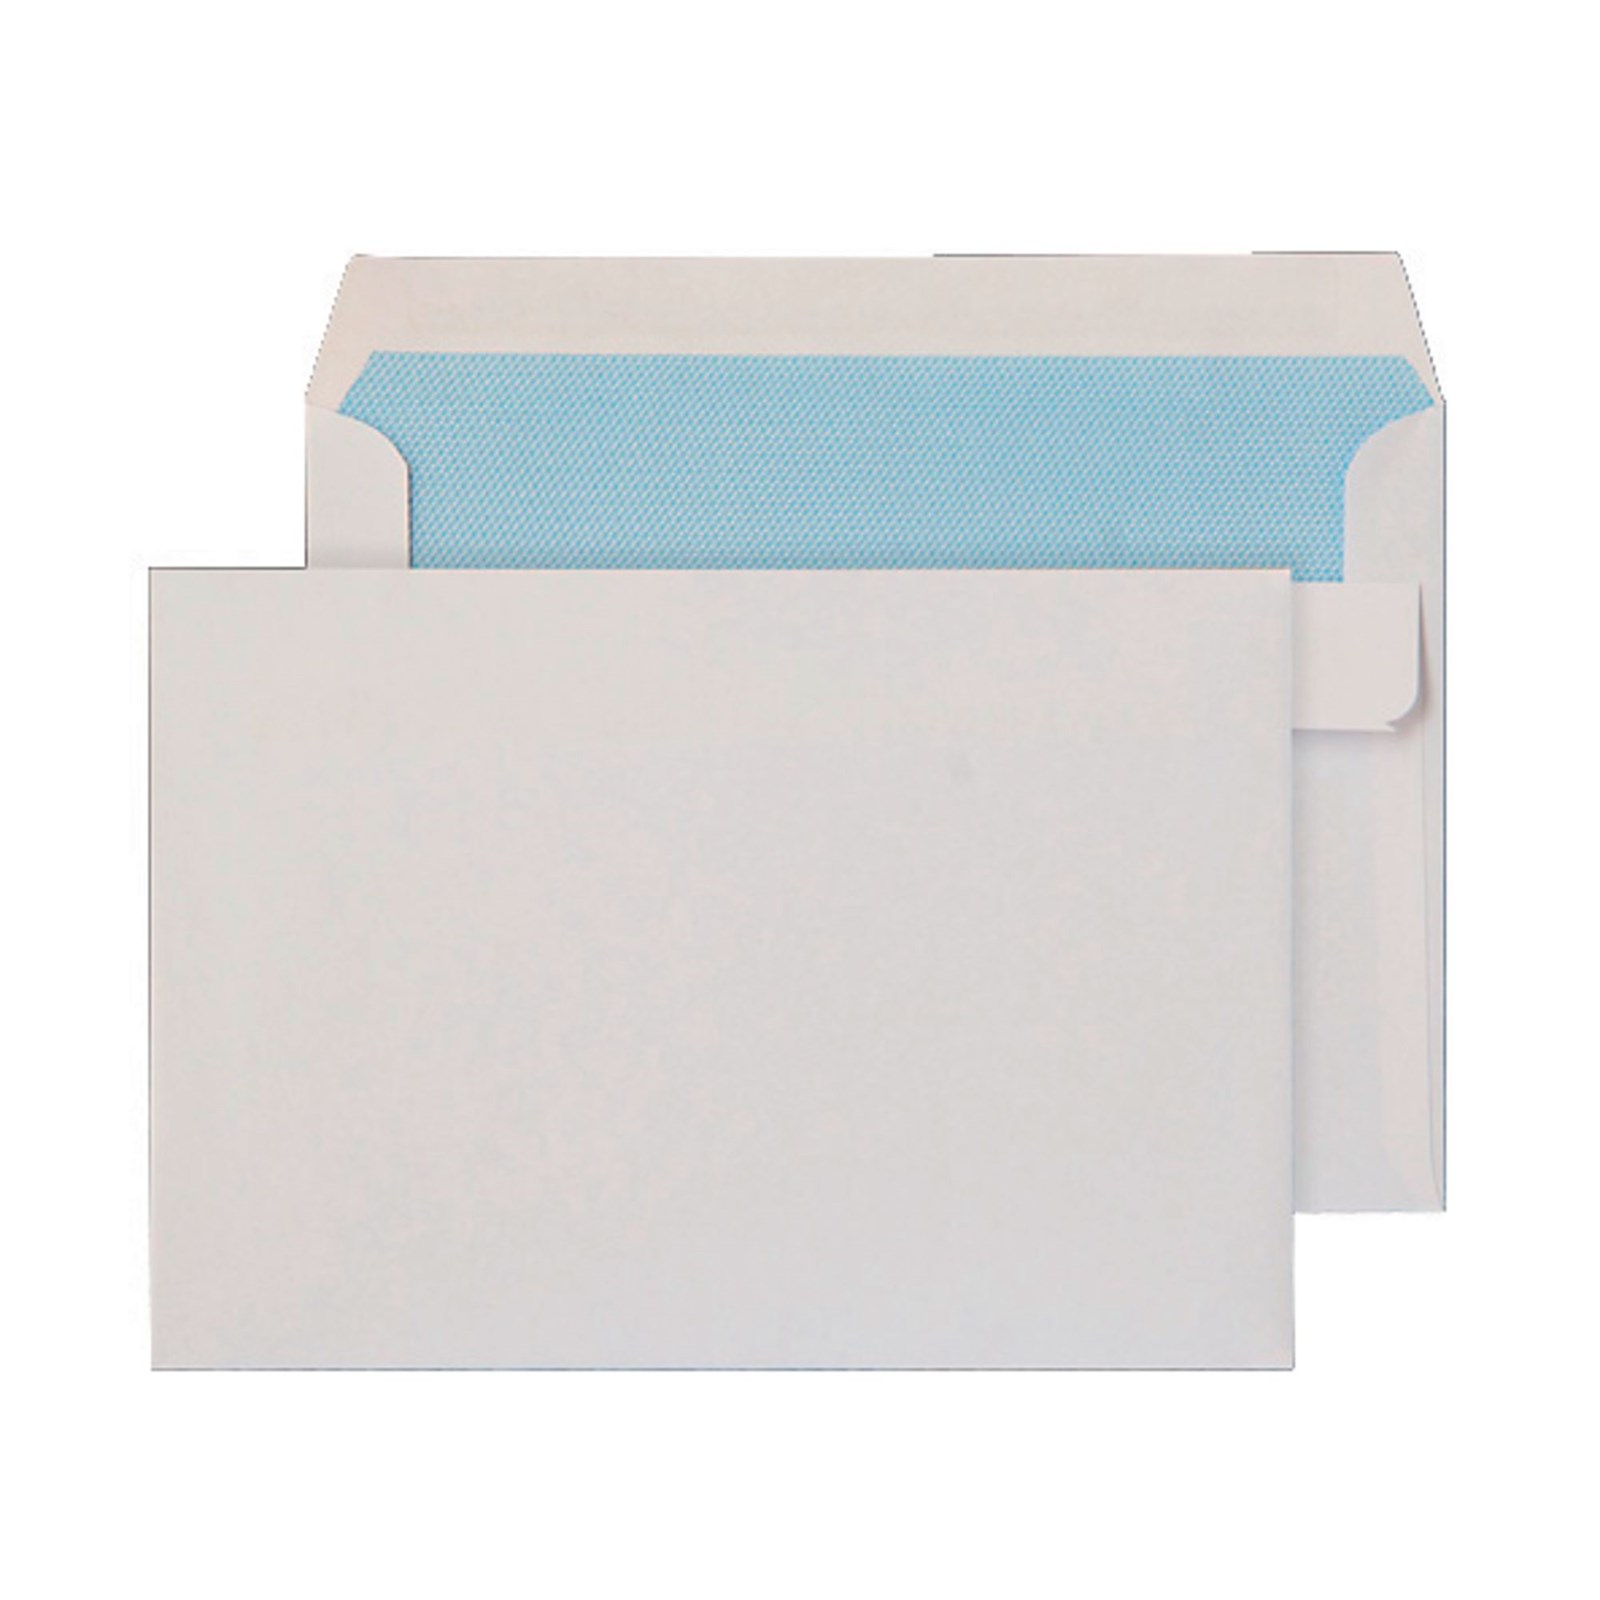 C6 White Self Seal Wallet Envelopes - Box of 50